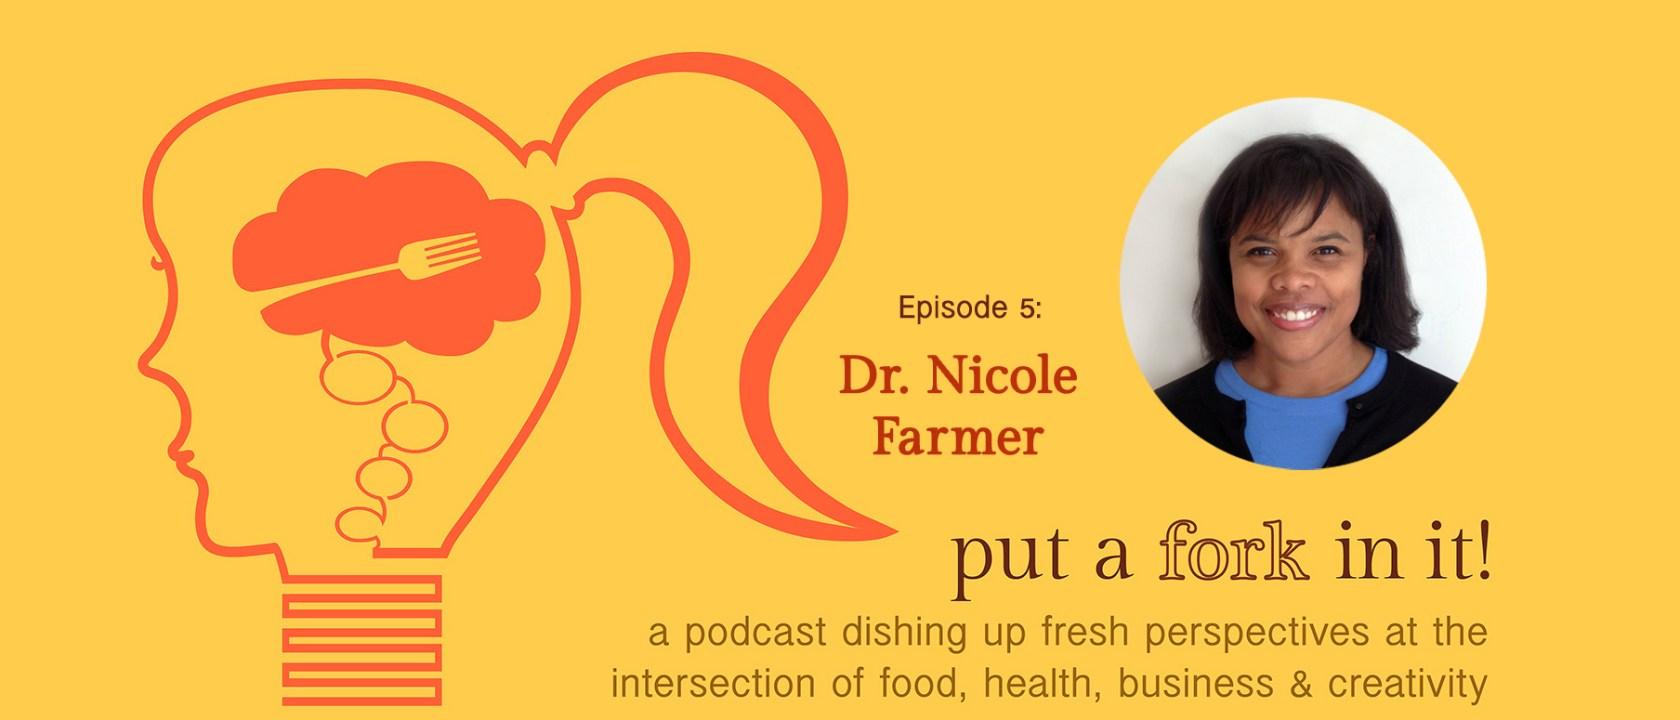 PAFII Episode 5: Dr. Nicole Farmer